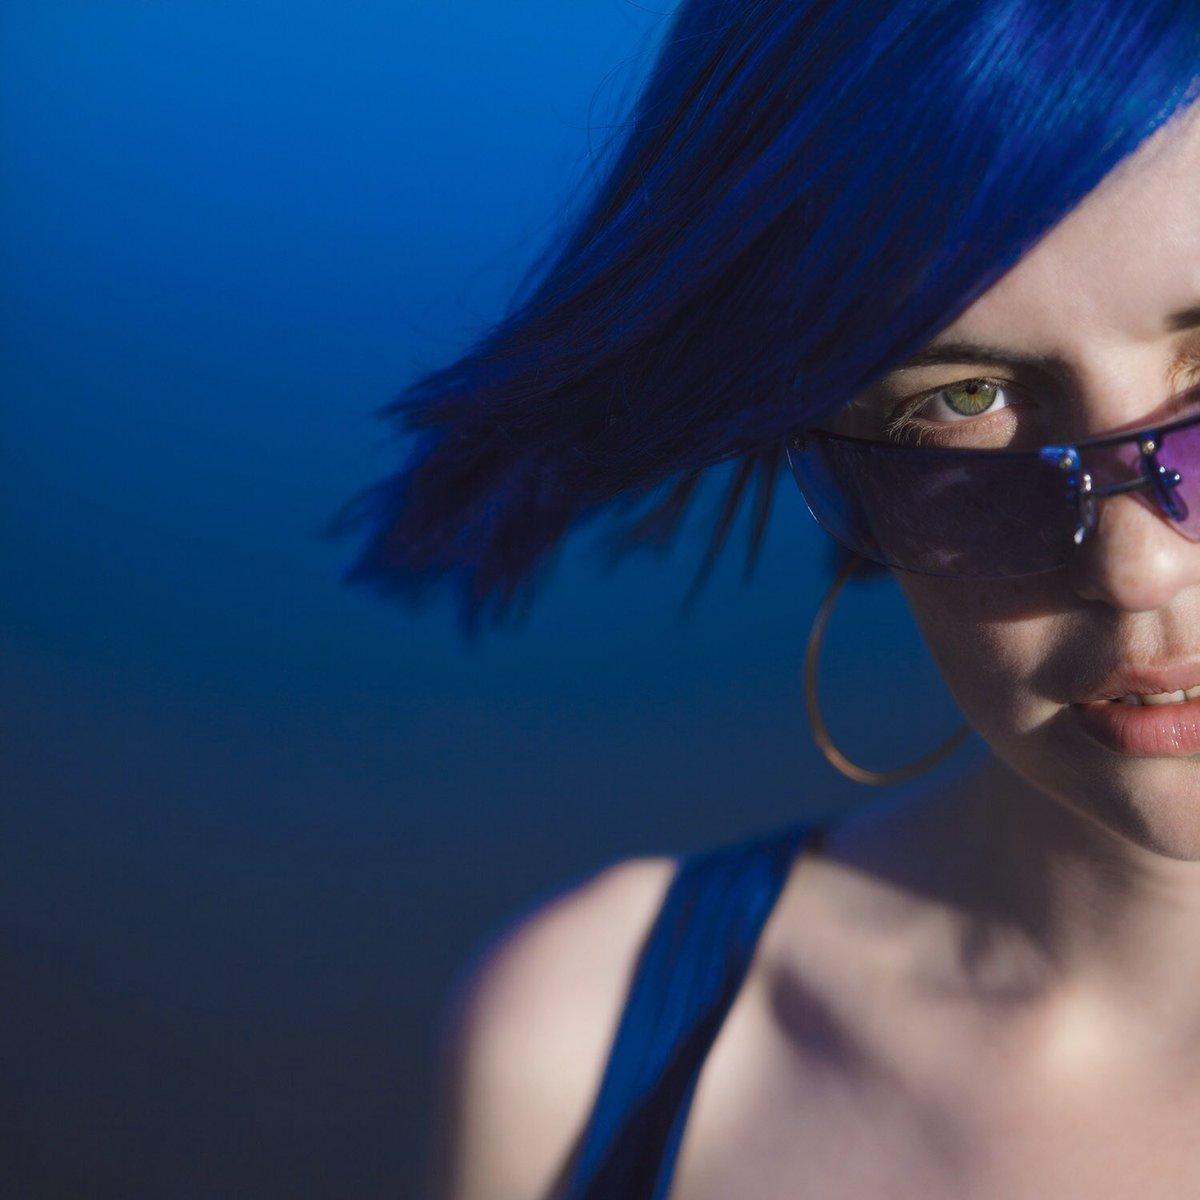 Listen: Ji Nilsson & WoodzSTHLM – Make Me Blu